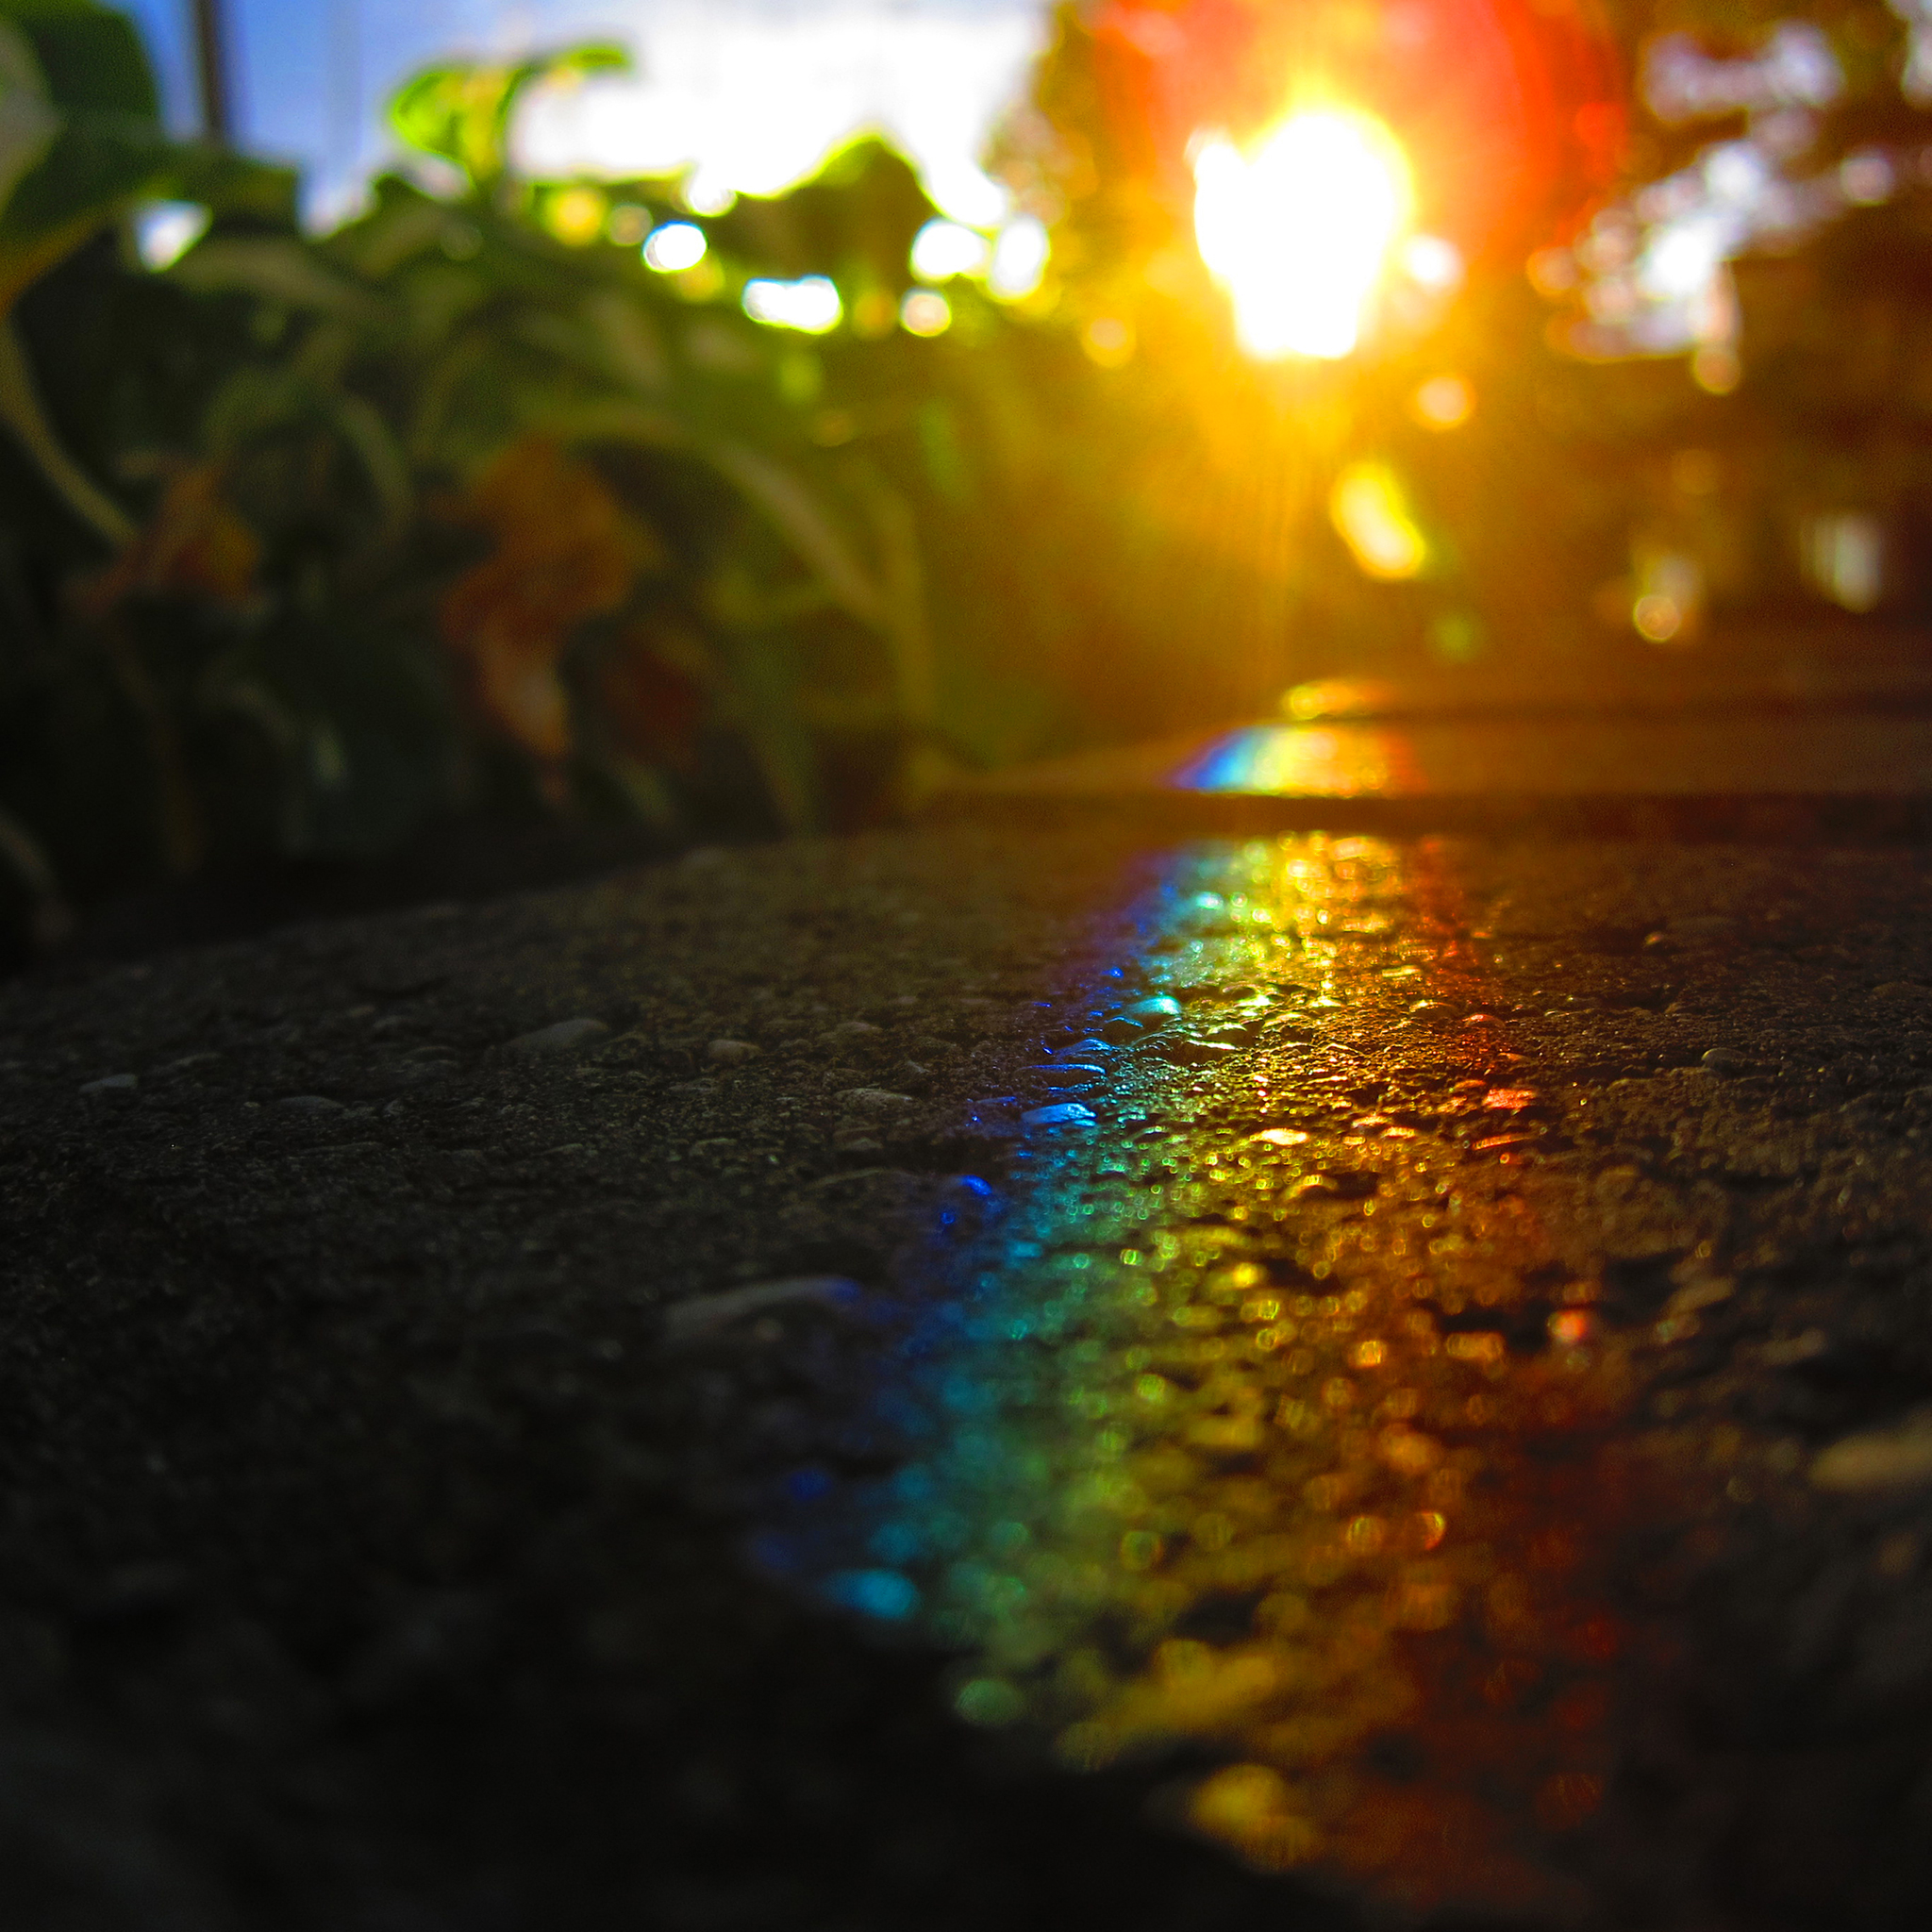 Street rainbow 3Wallpapers ipad Retina Street Rainbow   iPad Retina